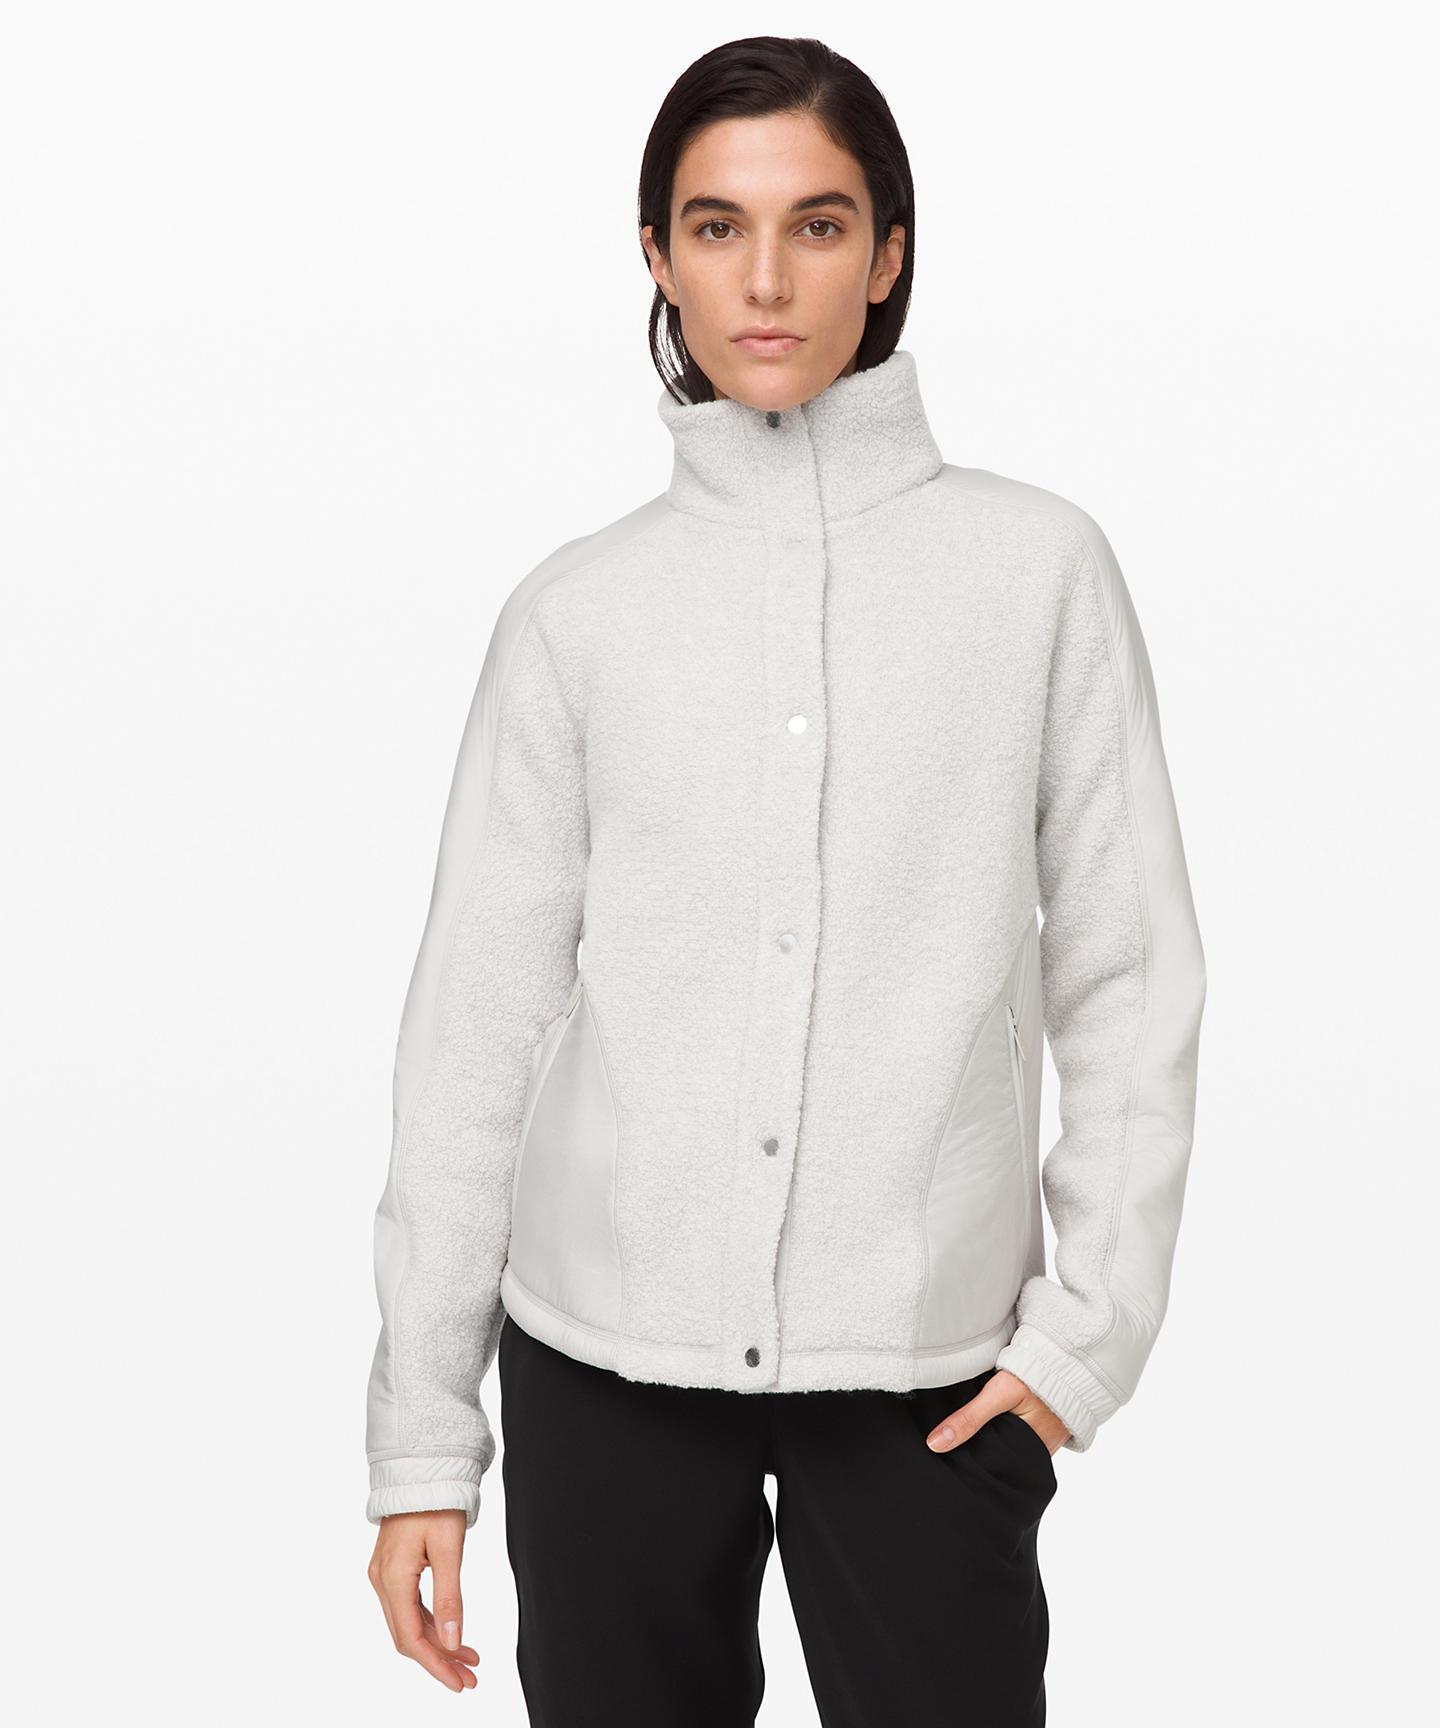 Go Cozy Jacket